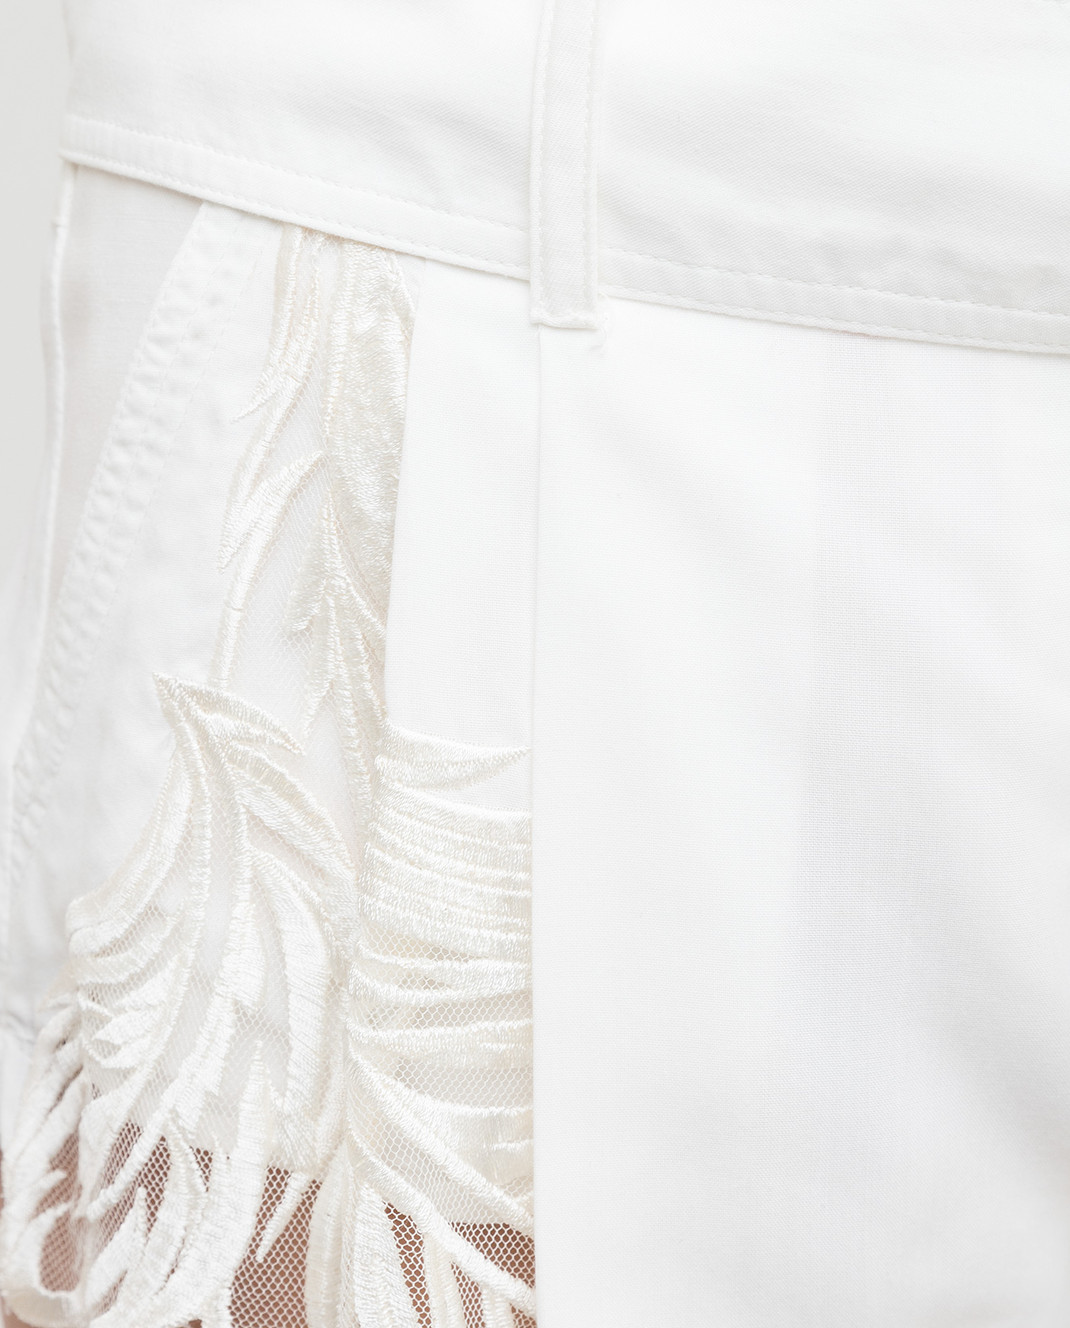 Roberto Cavalli Белые шорты CQR232 изображение 5